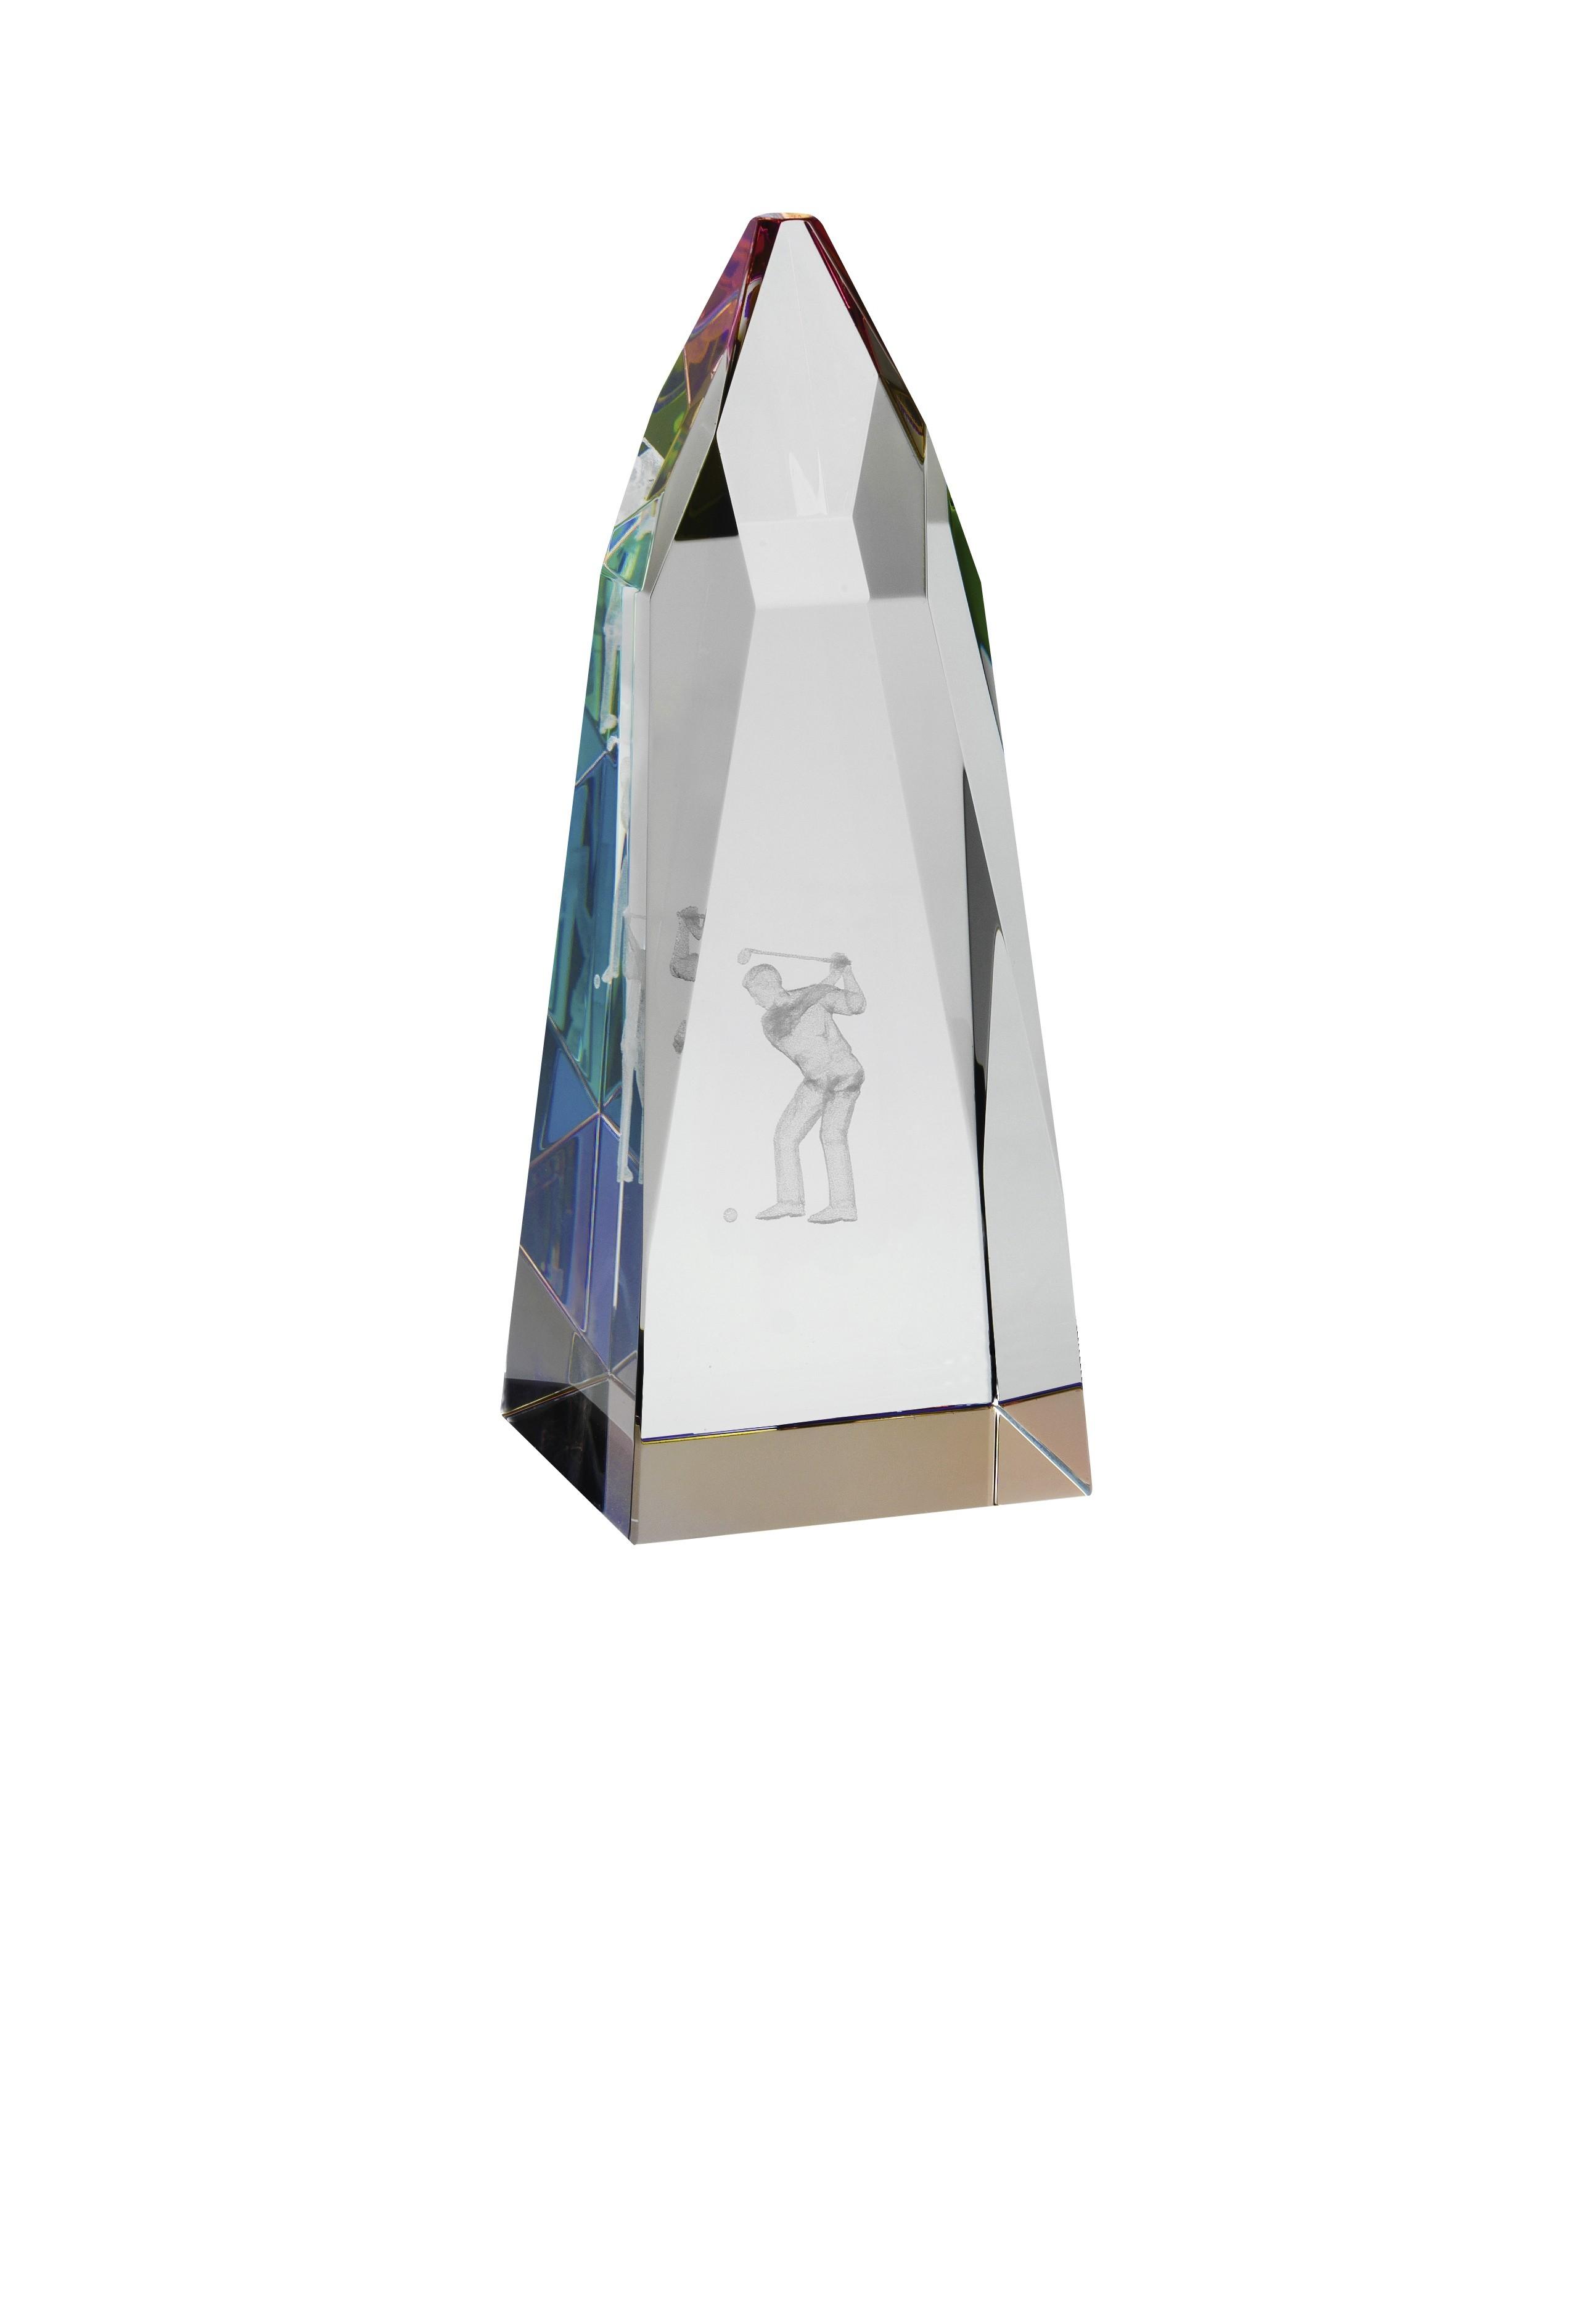 Crystal Golf Award